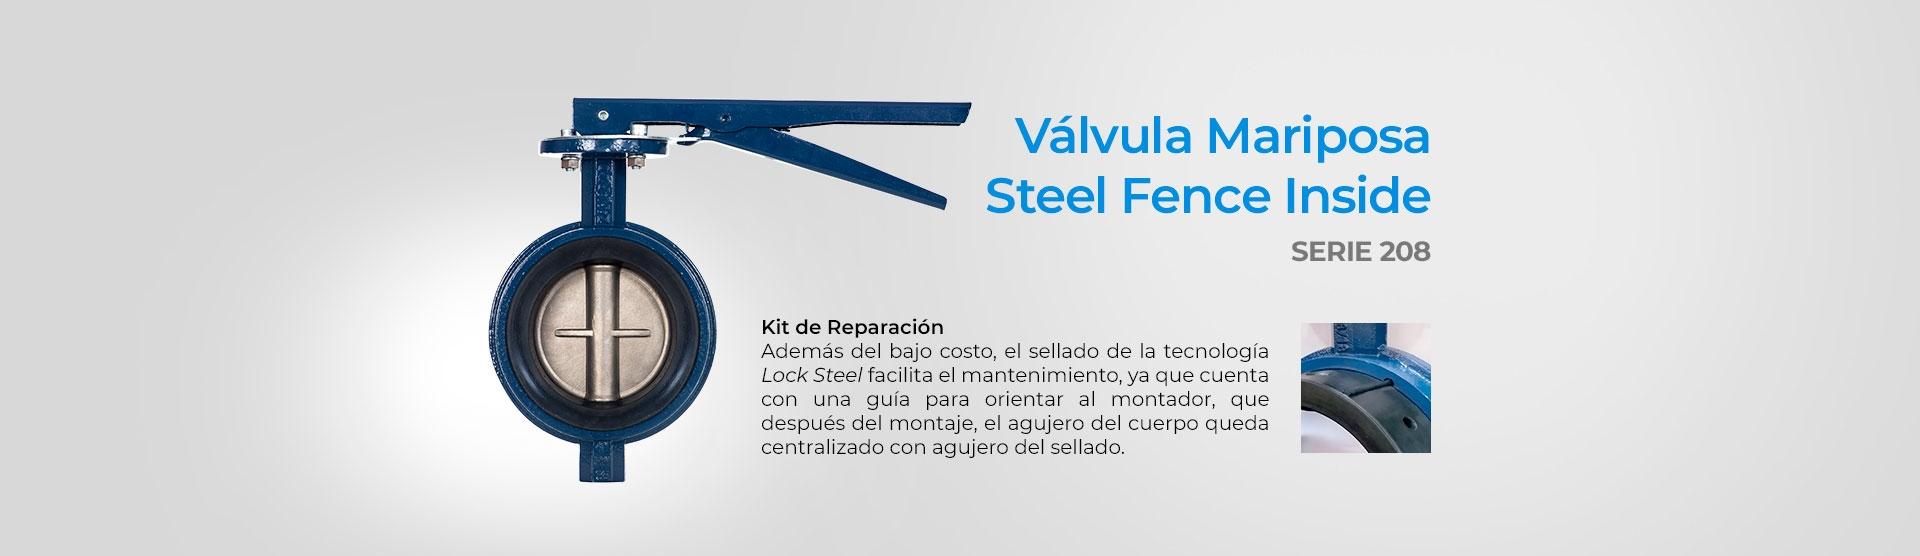 Válvula Mariposa Steel Fence Inside (Serie 200)